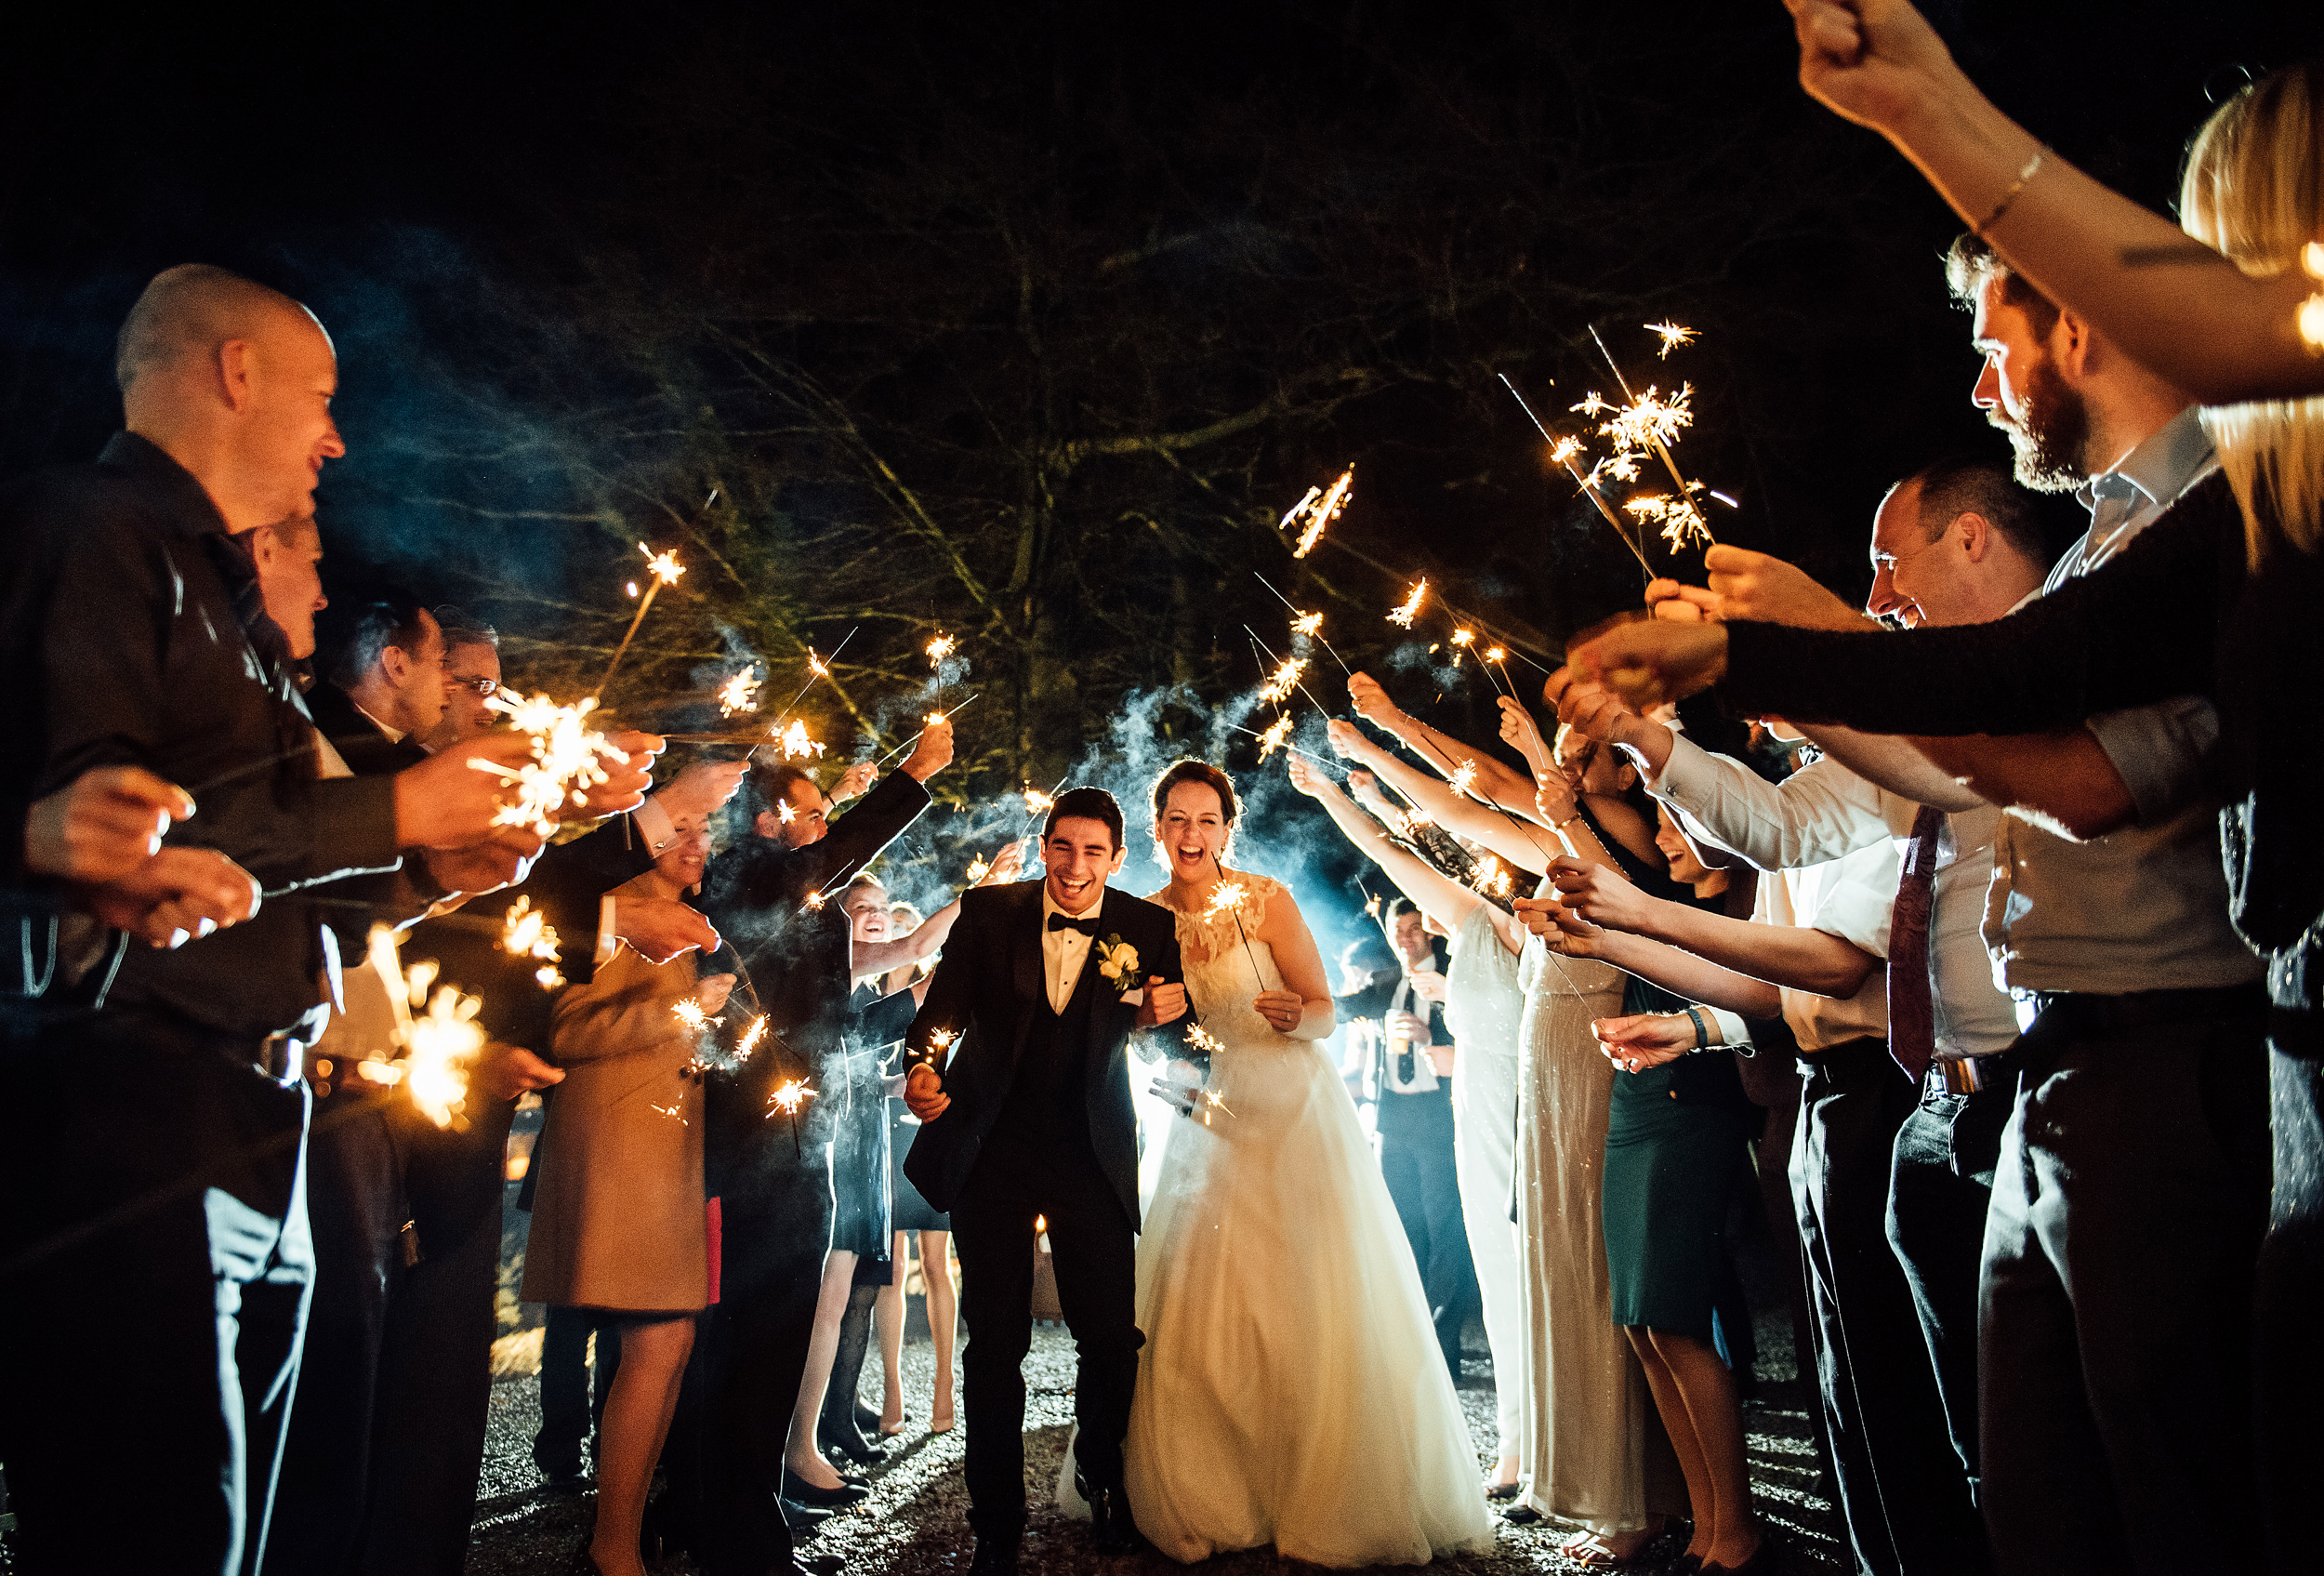 David Scholes Lancashire wedding photography 2016-8.jpg